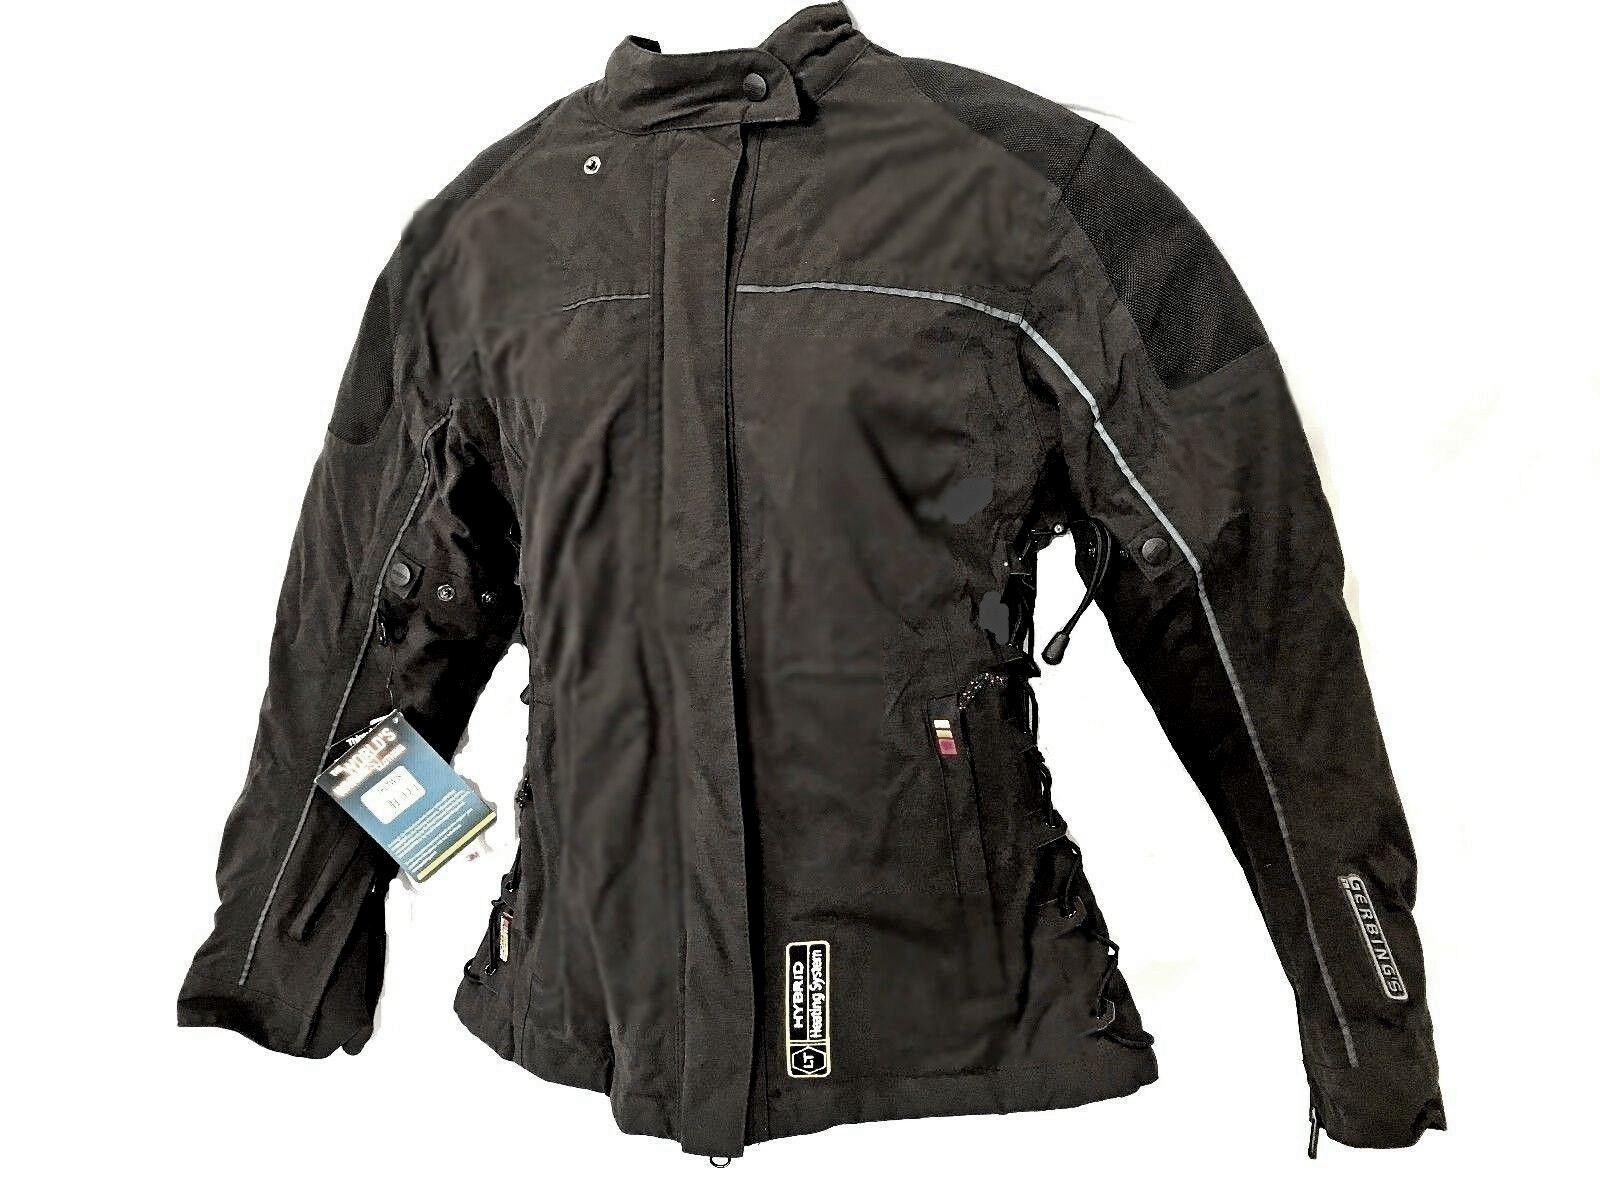 Gerbing heated jacket for women.